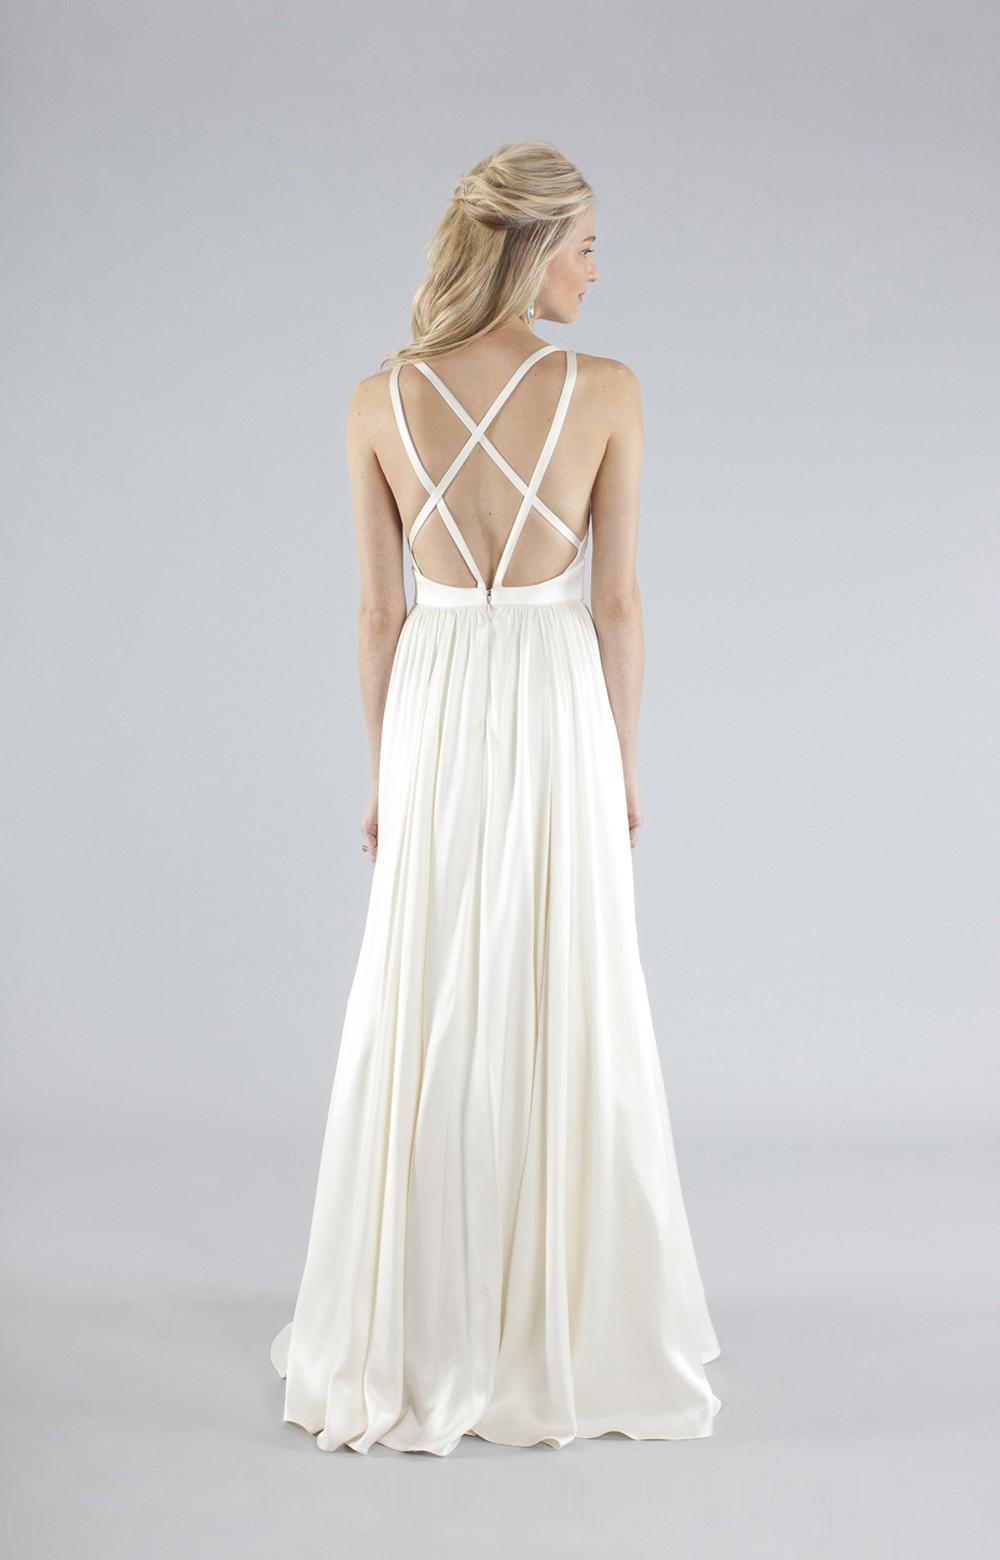 Lyst - Nicole Miller Elizabeth Bridal Gown in White